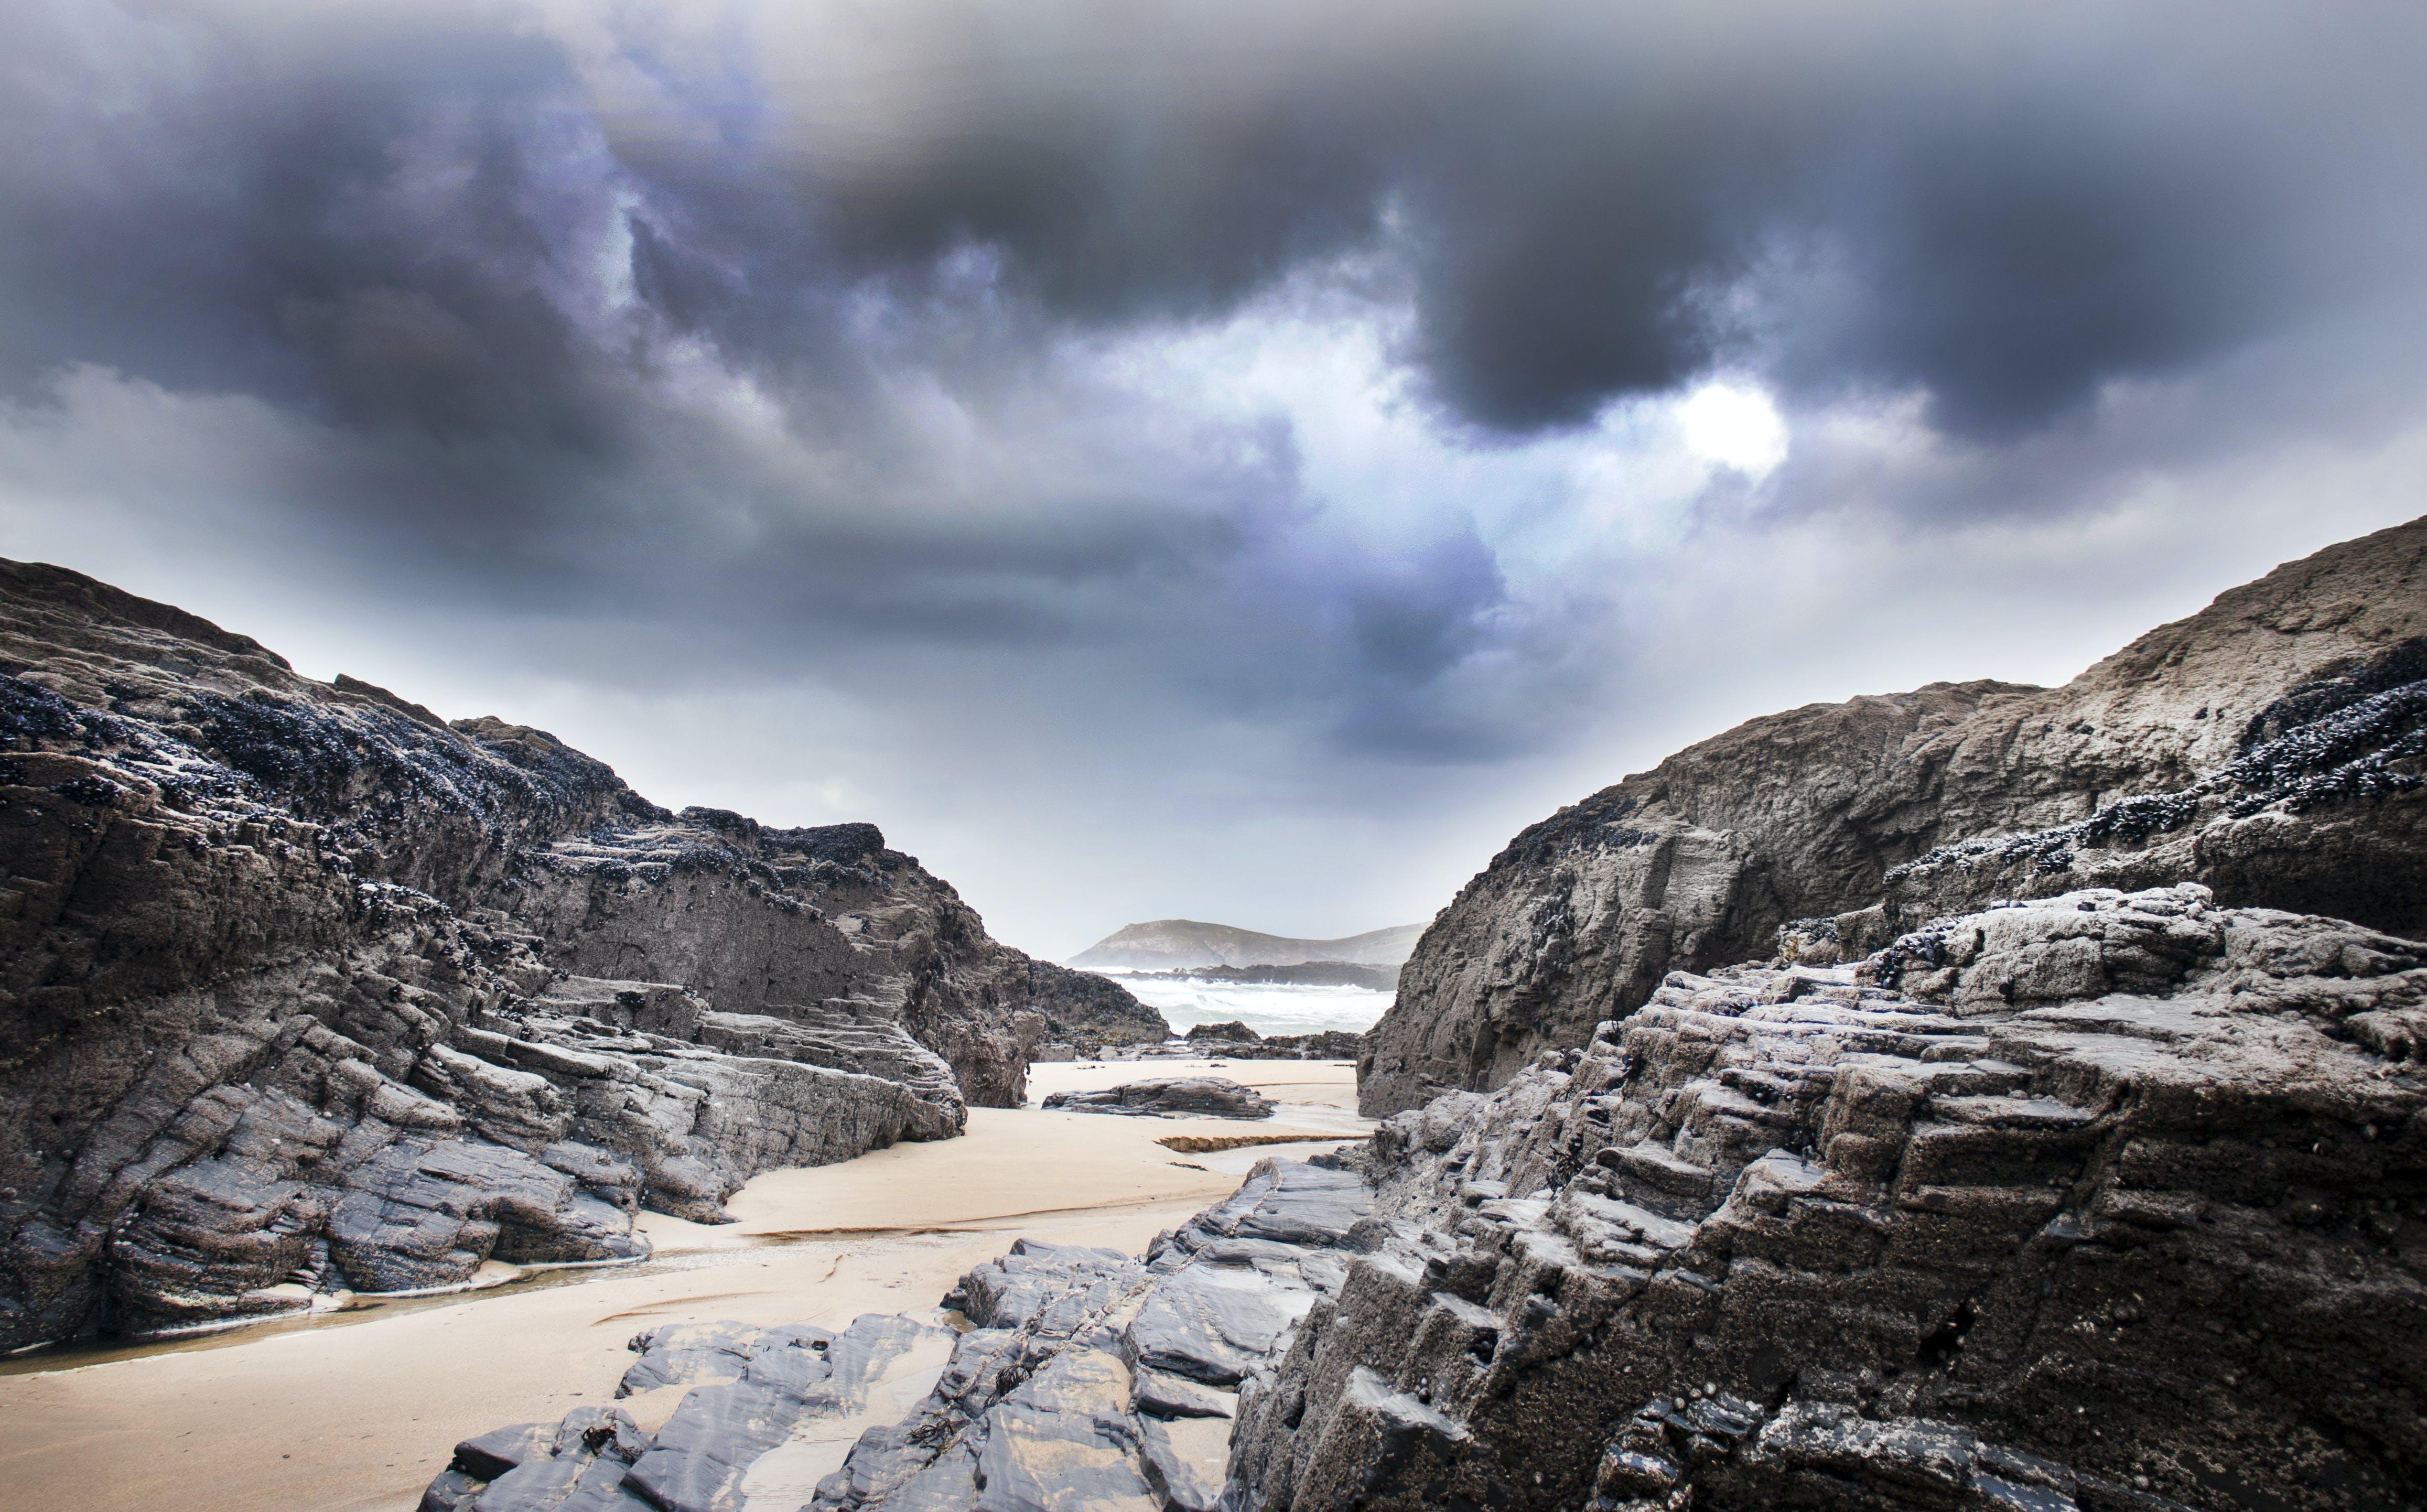 Seashore Sand and Rocks